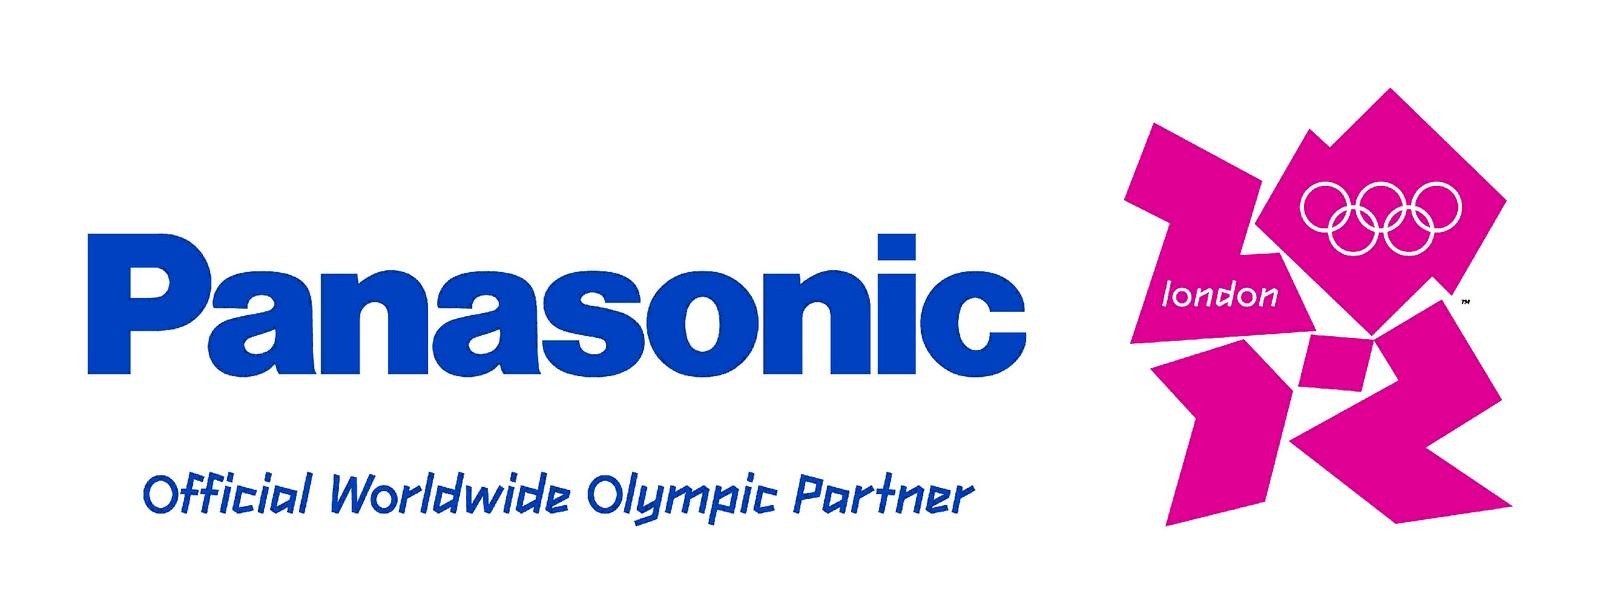 Logo PanasonicsLondonOlympics